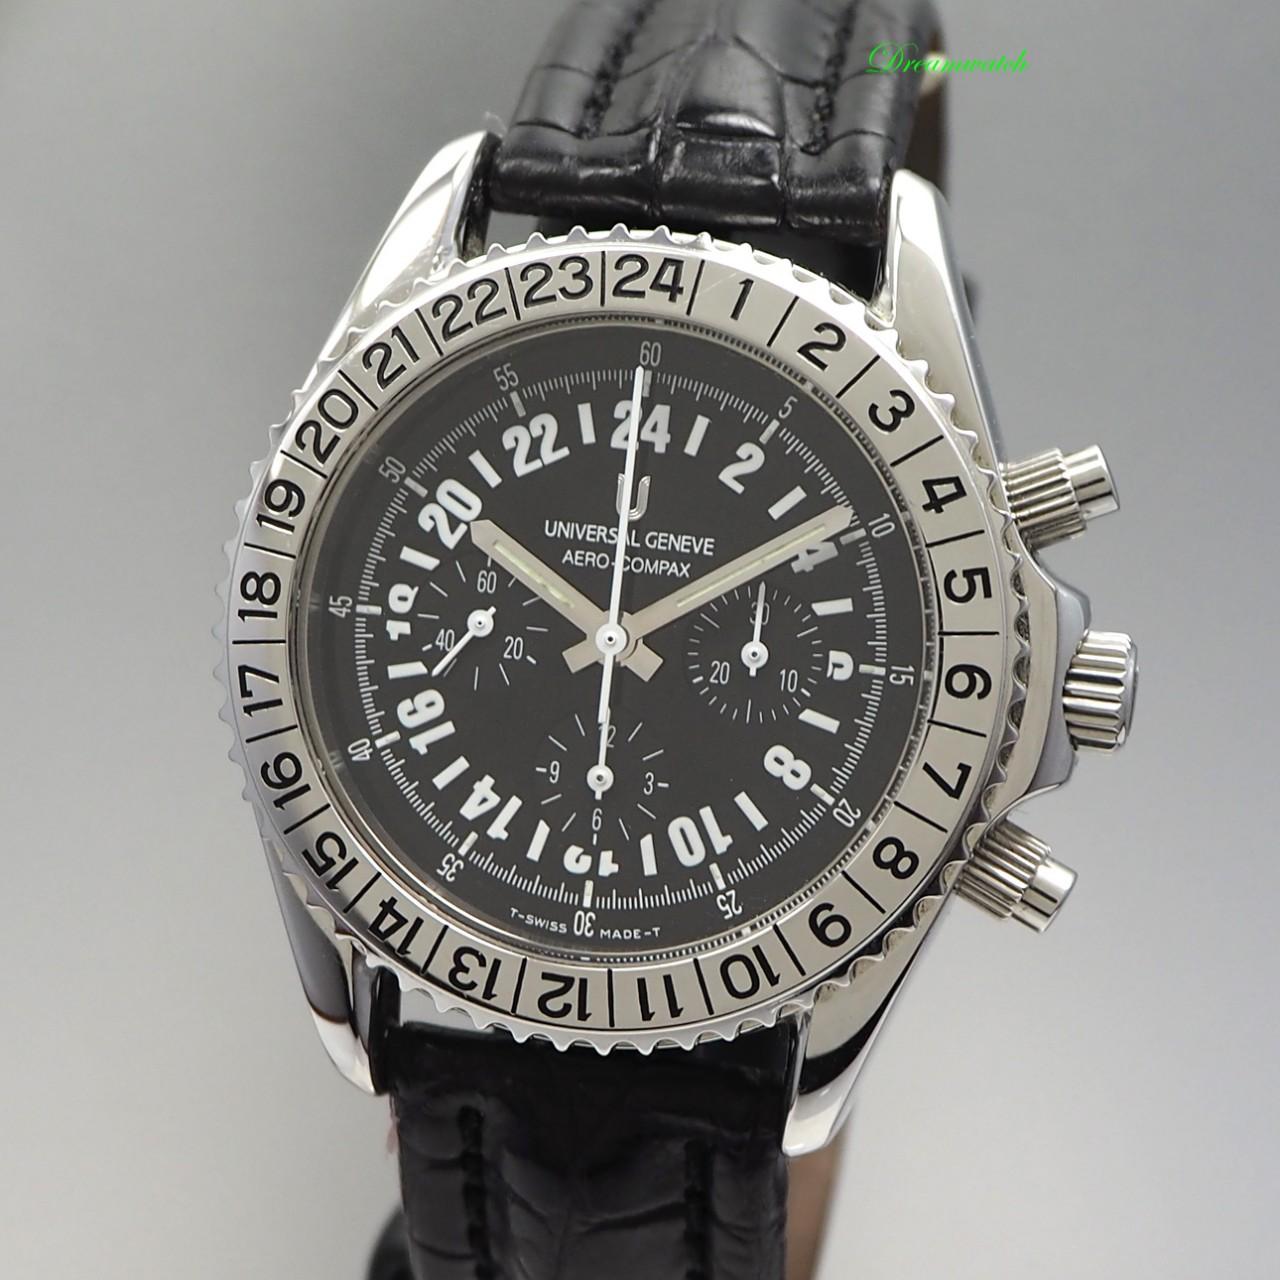 Universal Geneve Aero Compax 24H Chronograph 882.424